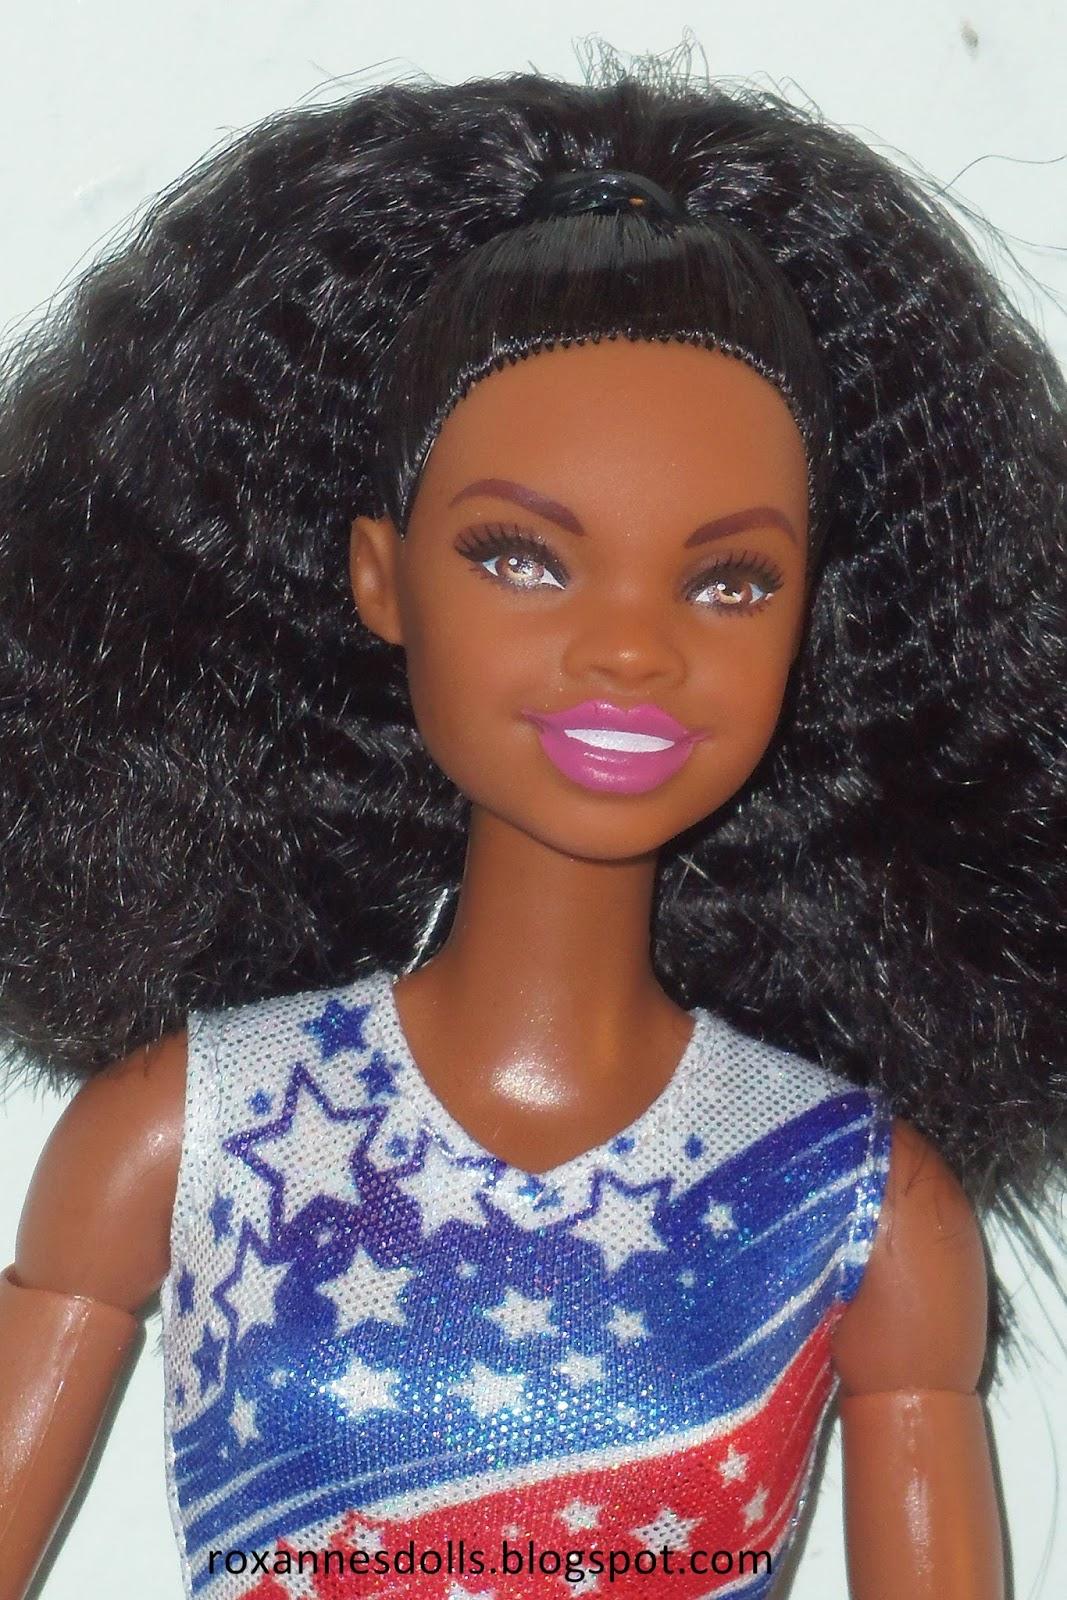 roxannes dolls gabby douglas barbie